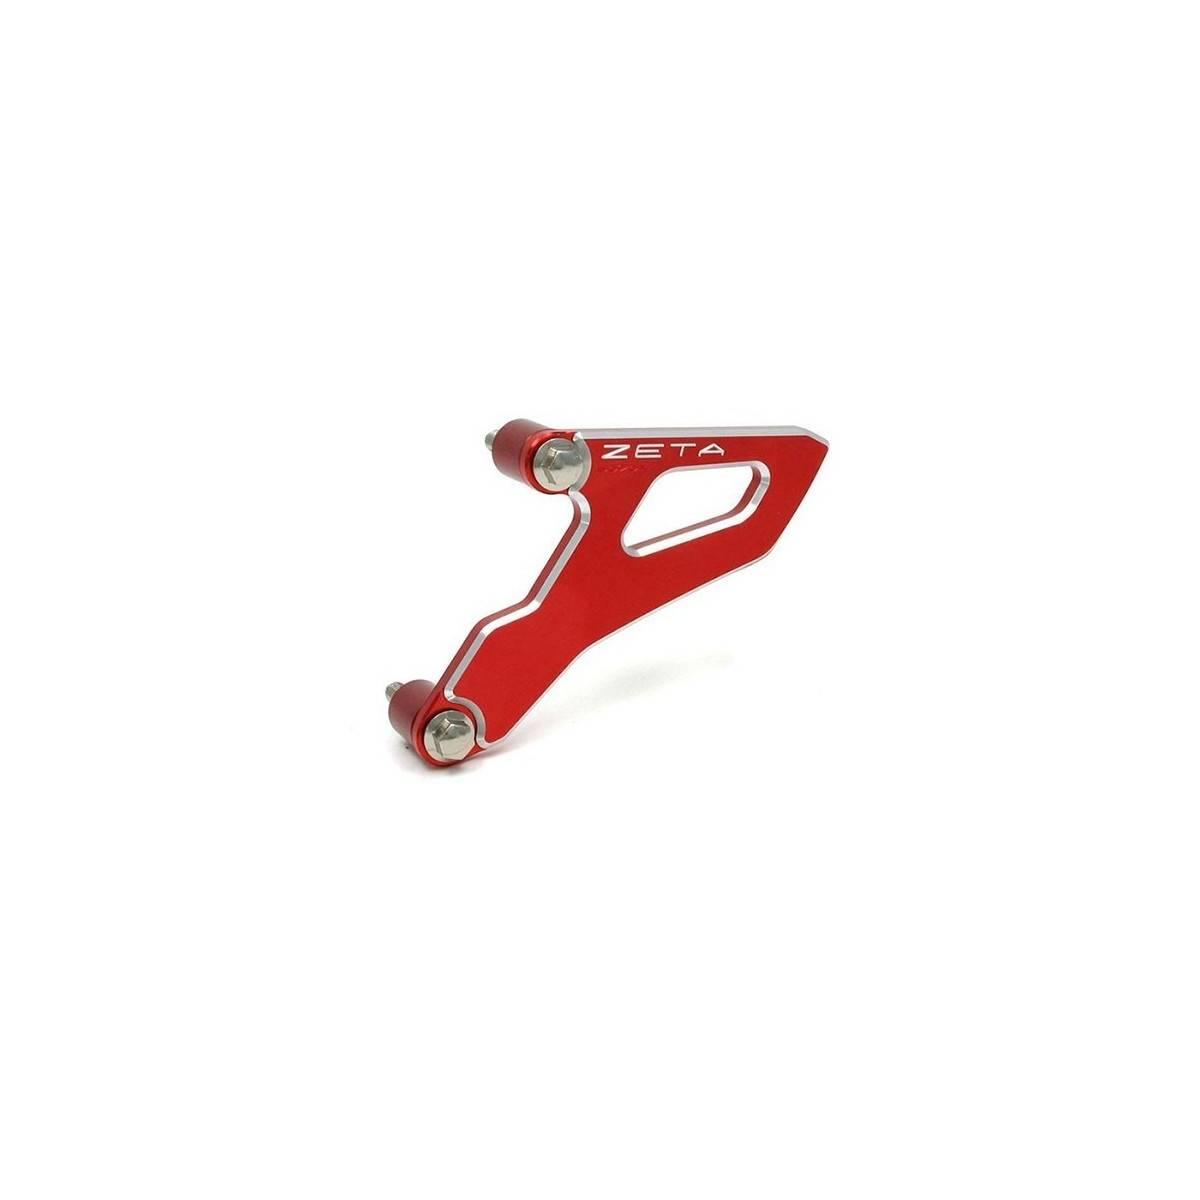 ZE80.9025 - Protector Piñon Salida Zeta Aluminio Suzuki Rmz 250 450 05 17 Rojo